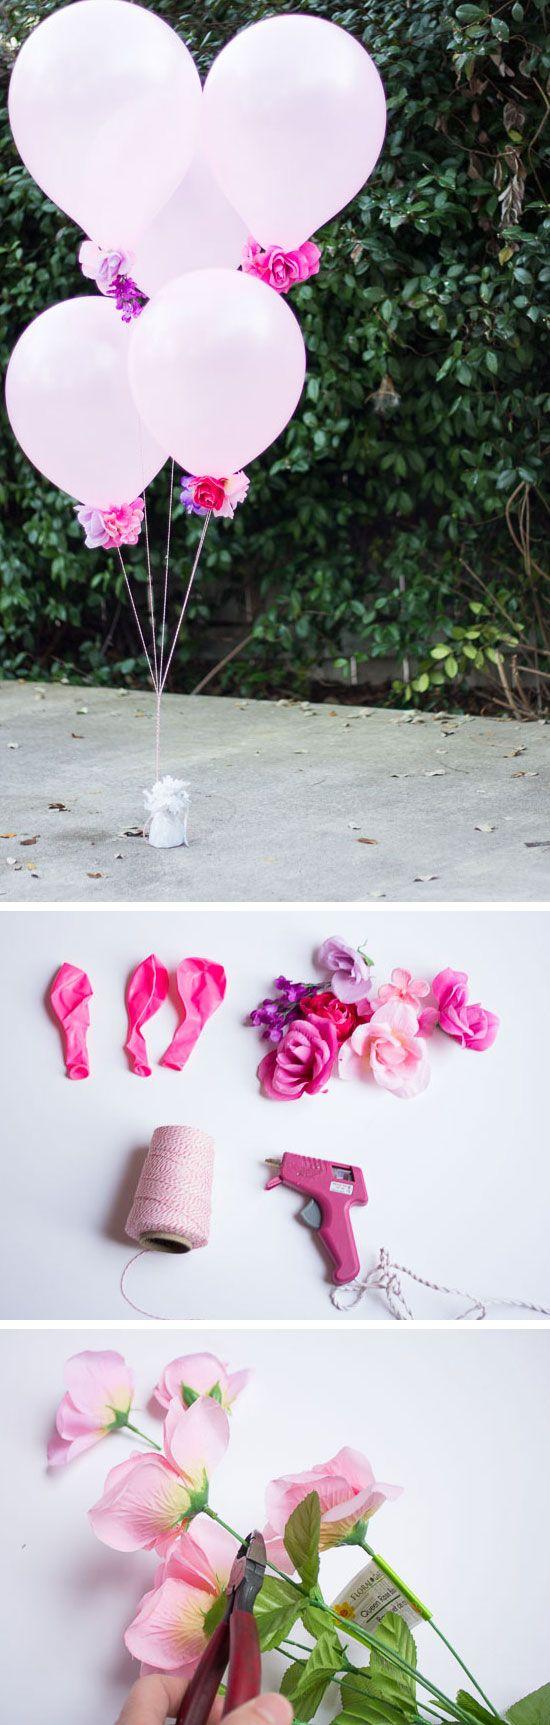 Flower Balloons | Click Pic for 22 DIY Summer Wedding Ideas on a Budget | DIY Garden Wedding Ideas on a Budget